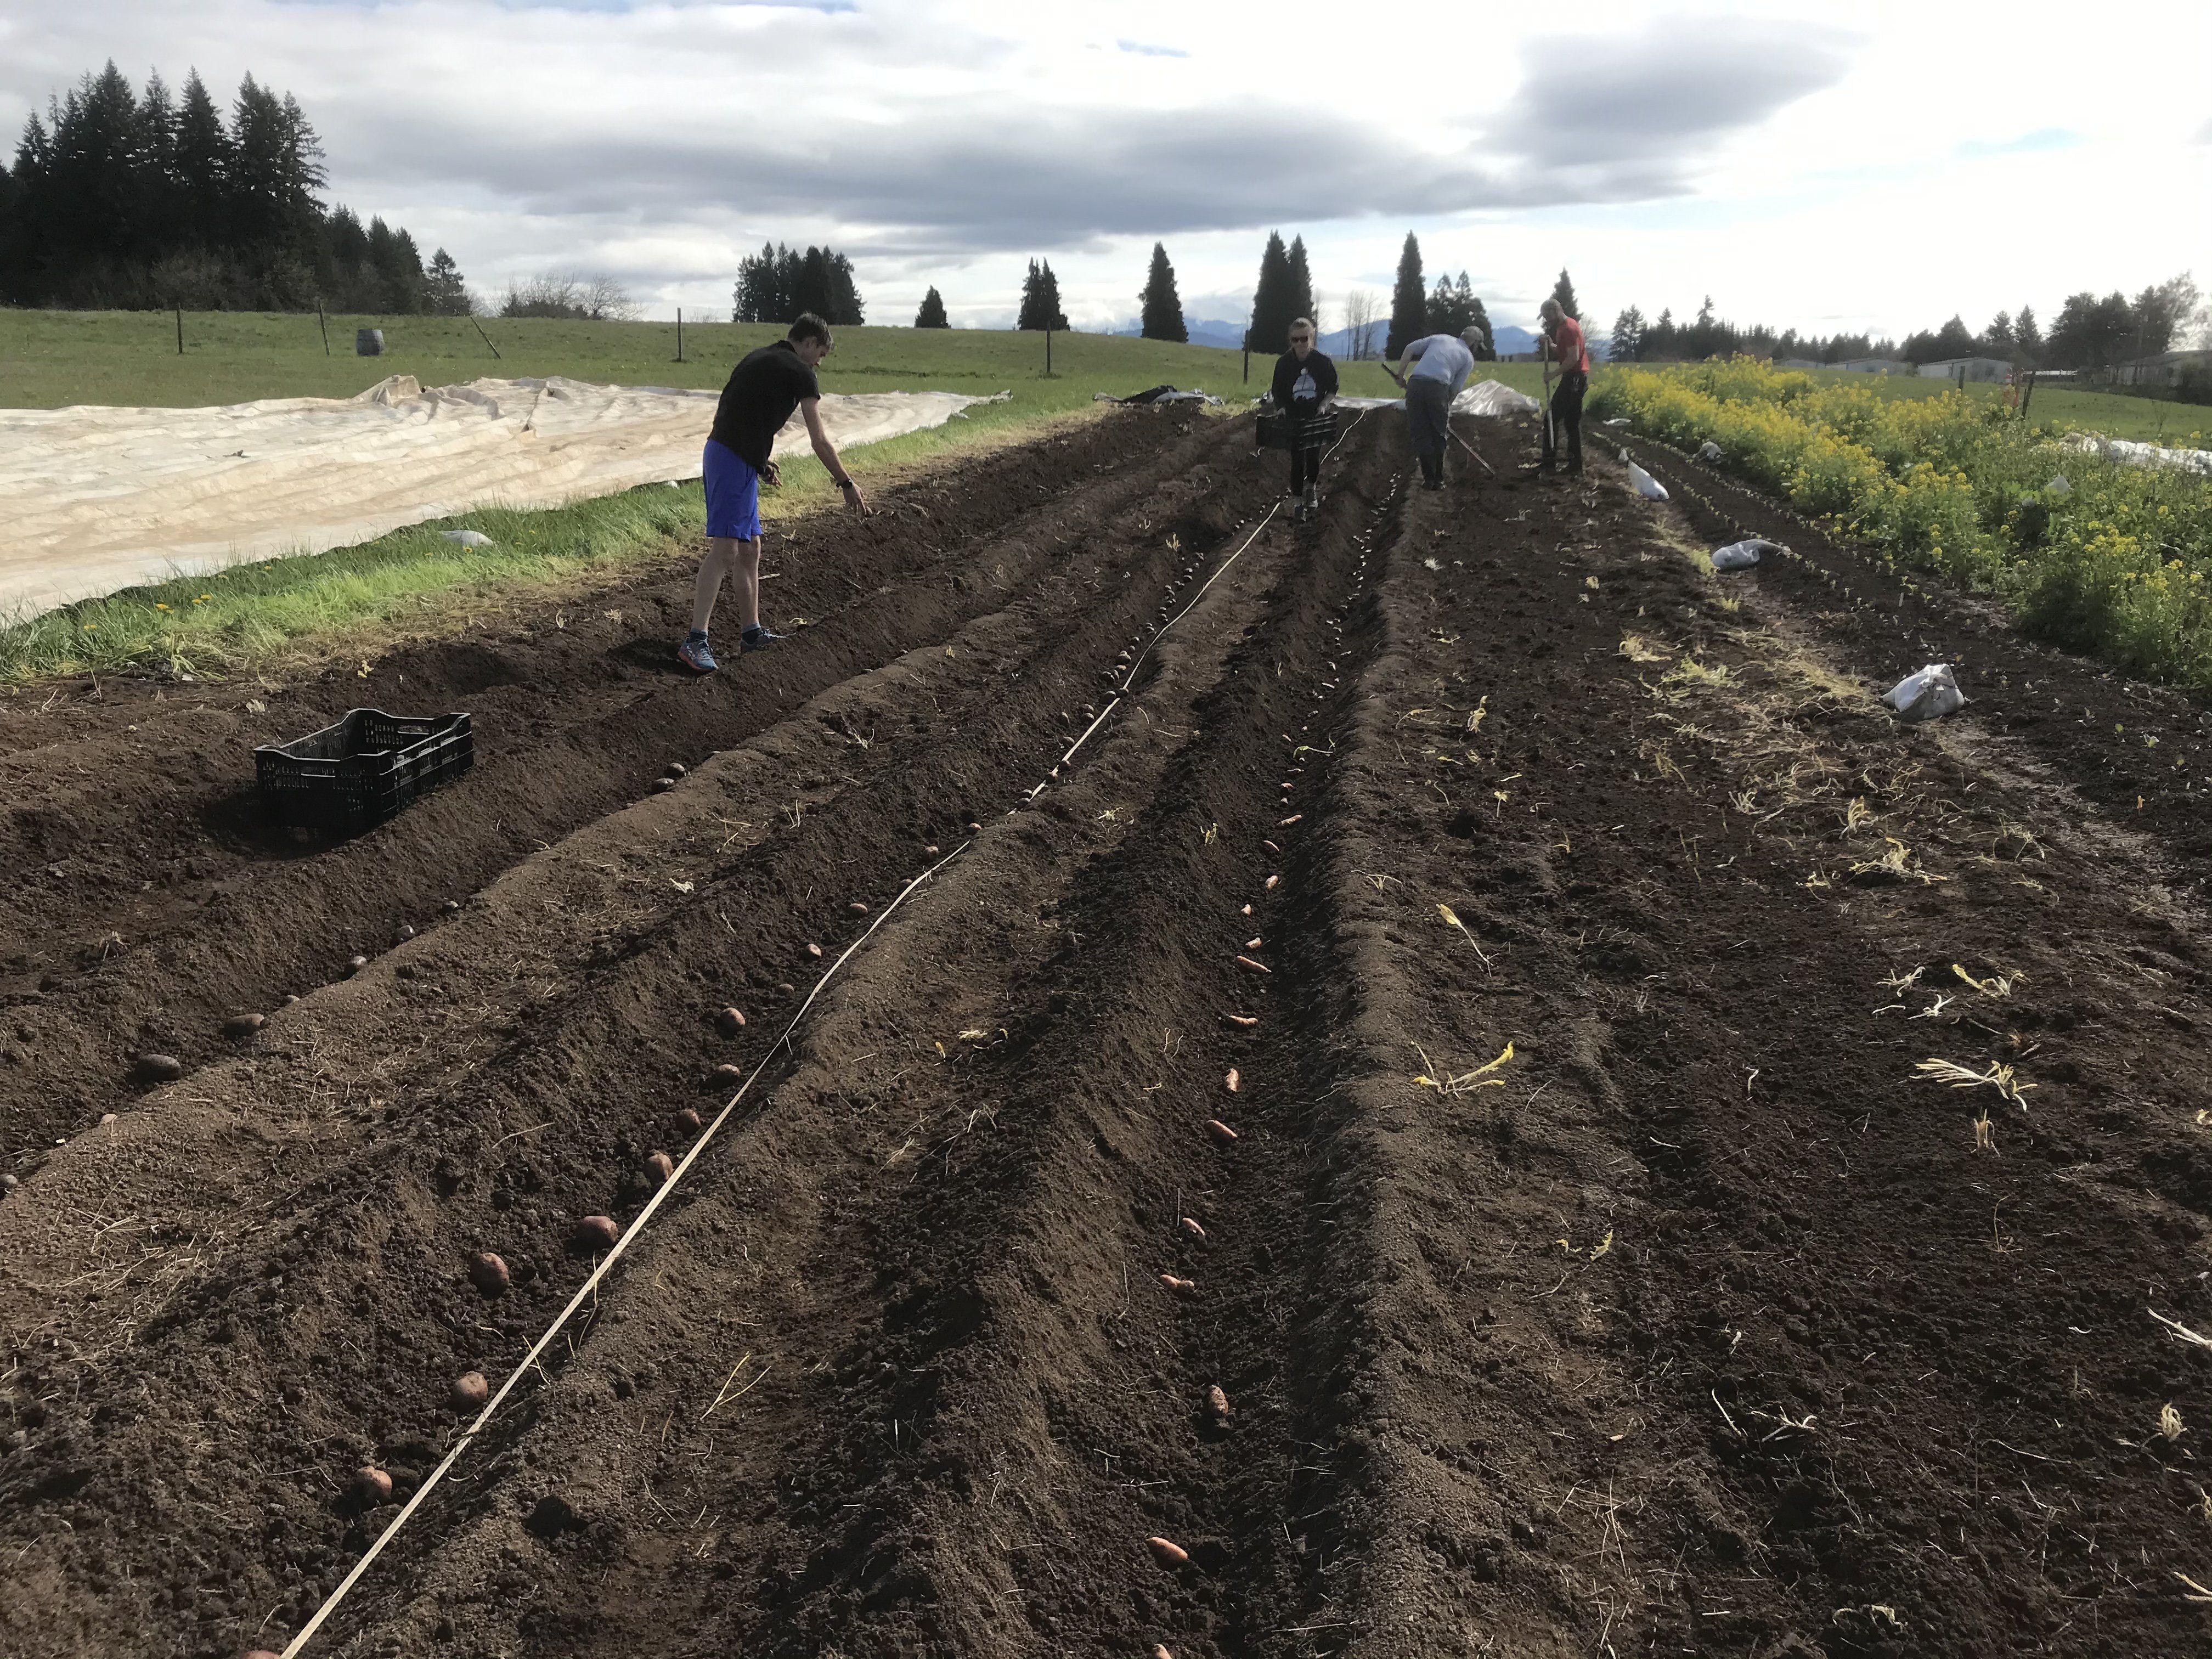 Farm Happenings for April 10, 2020